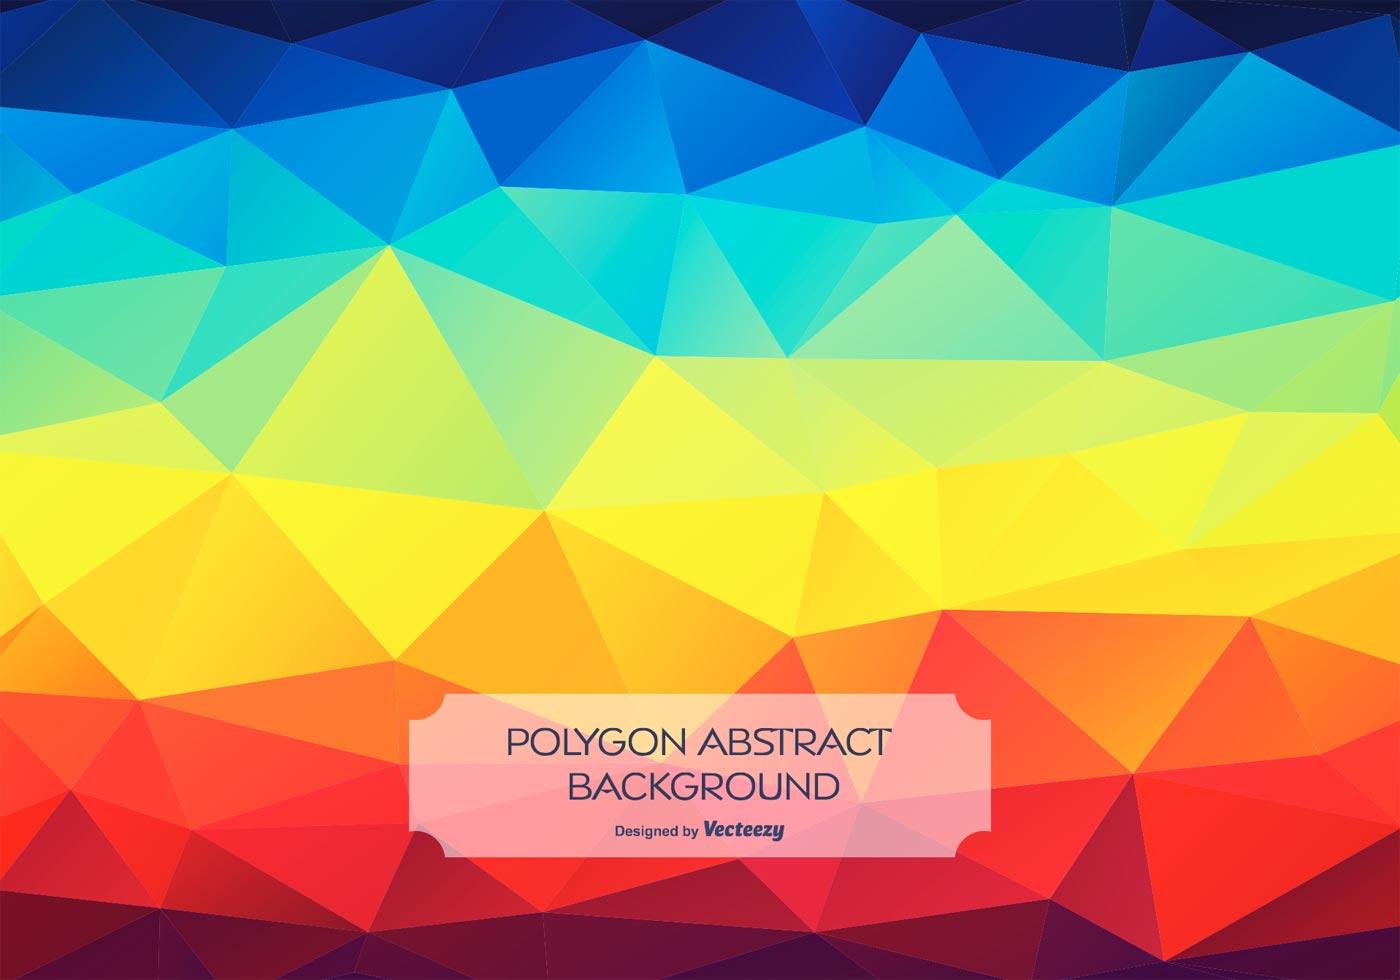 Rainbow Abstract Polygon Style Background Illustration